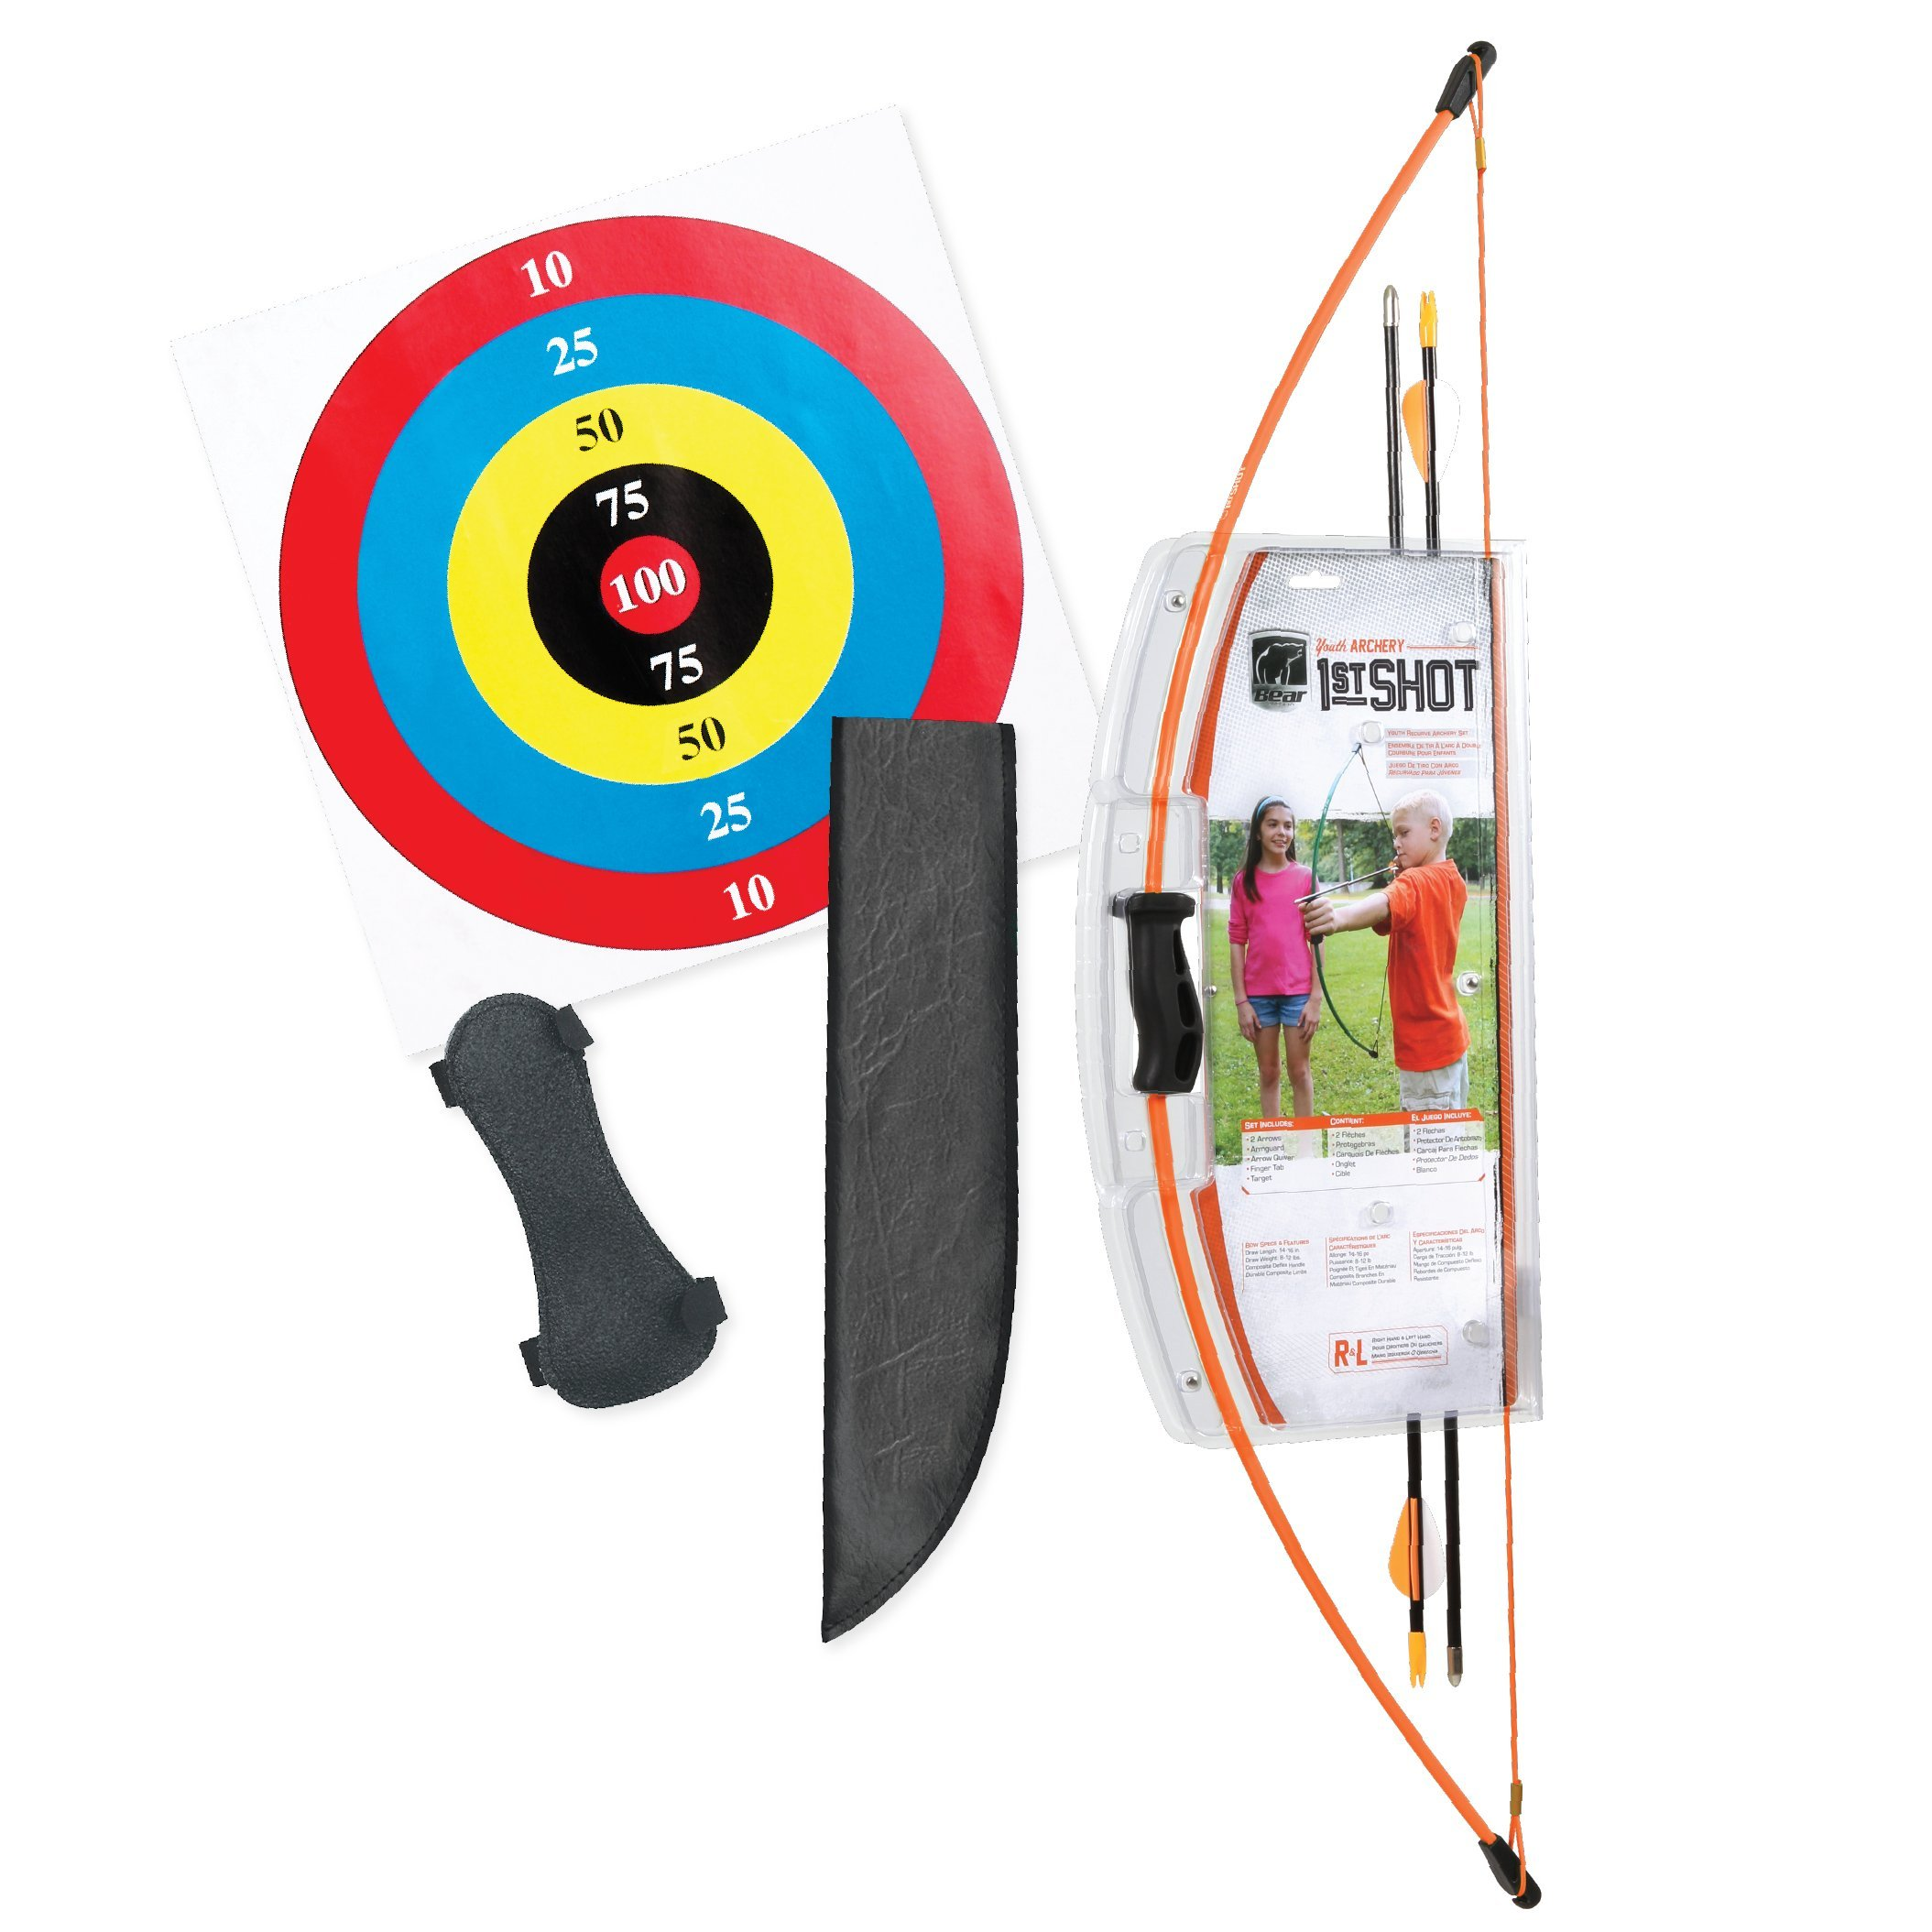 Bear Archery 1st Shot Youth Bow Set - Flo Orange by Bear Archery